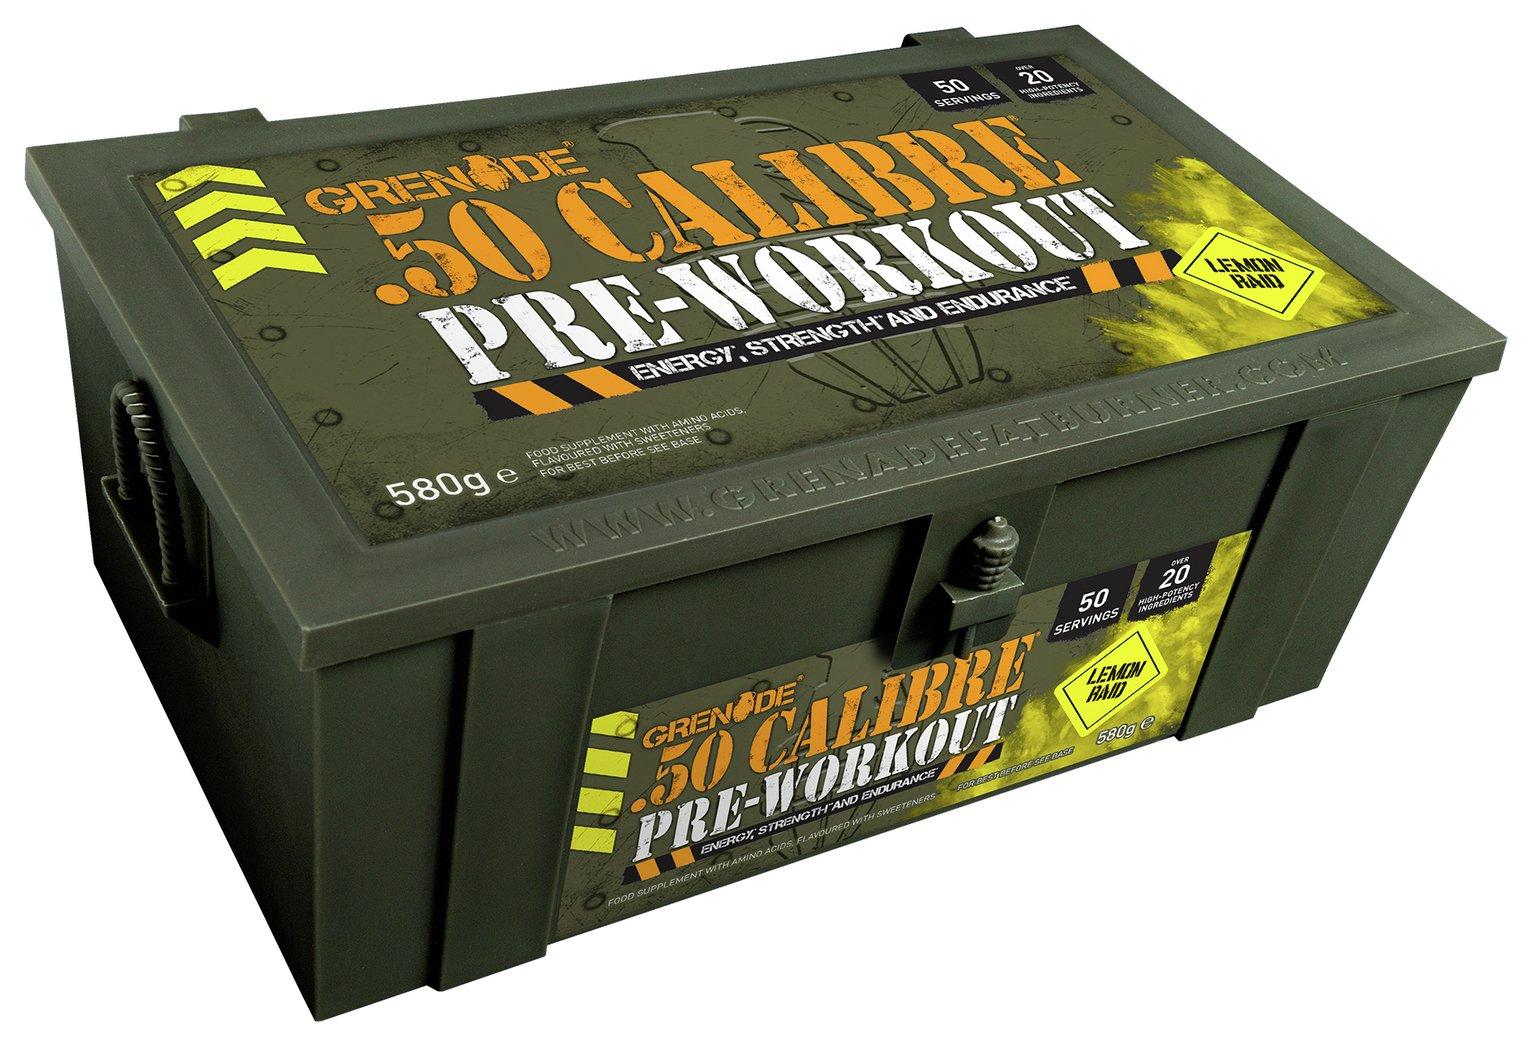 Image of Grenade - 50 Calibre 580g Ammo Box - Lemon Raid